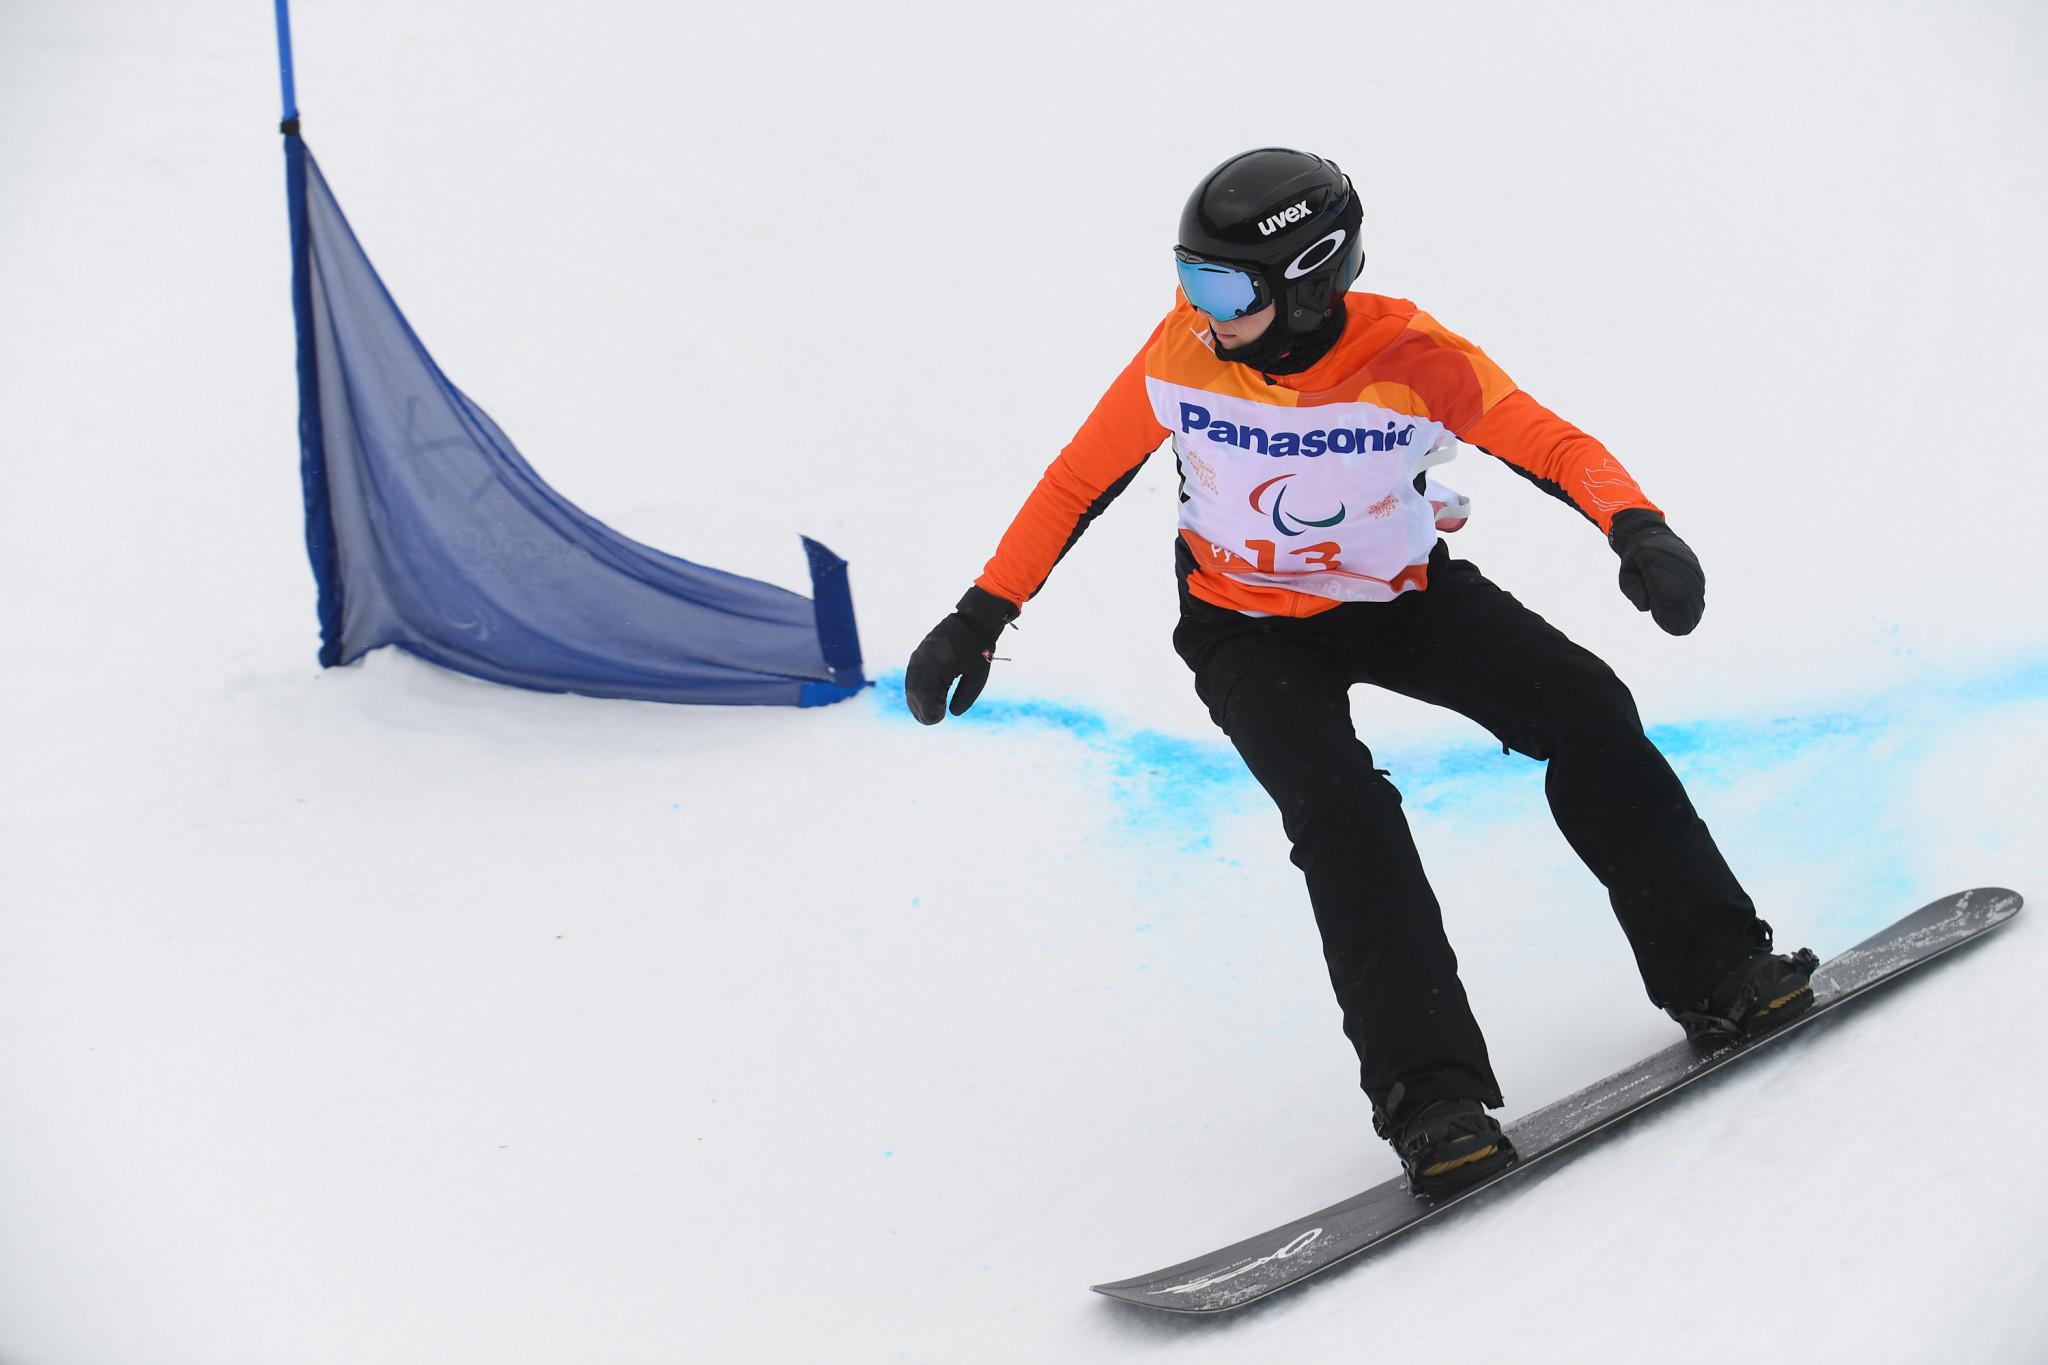 Dutch stars impress as Para Snowboard World Cup season begins